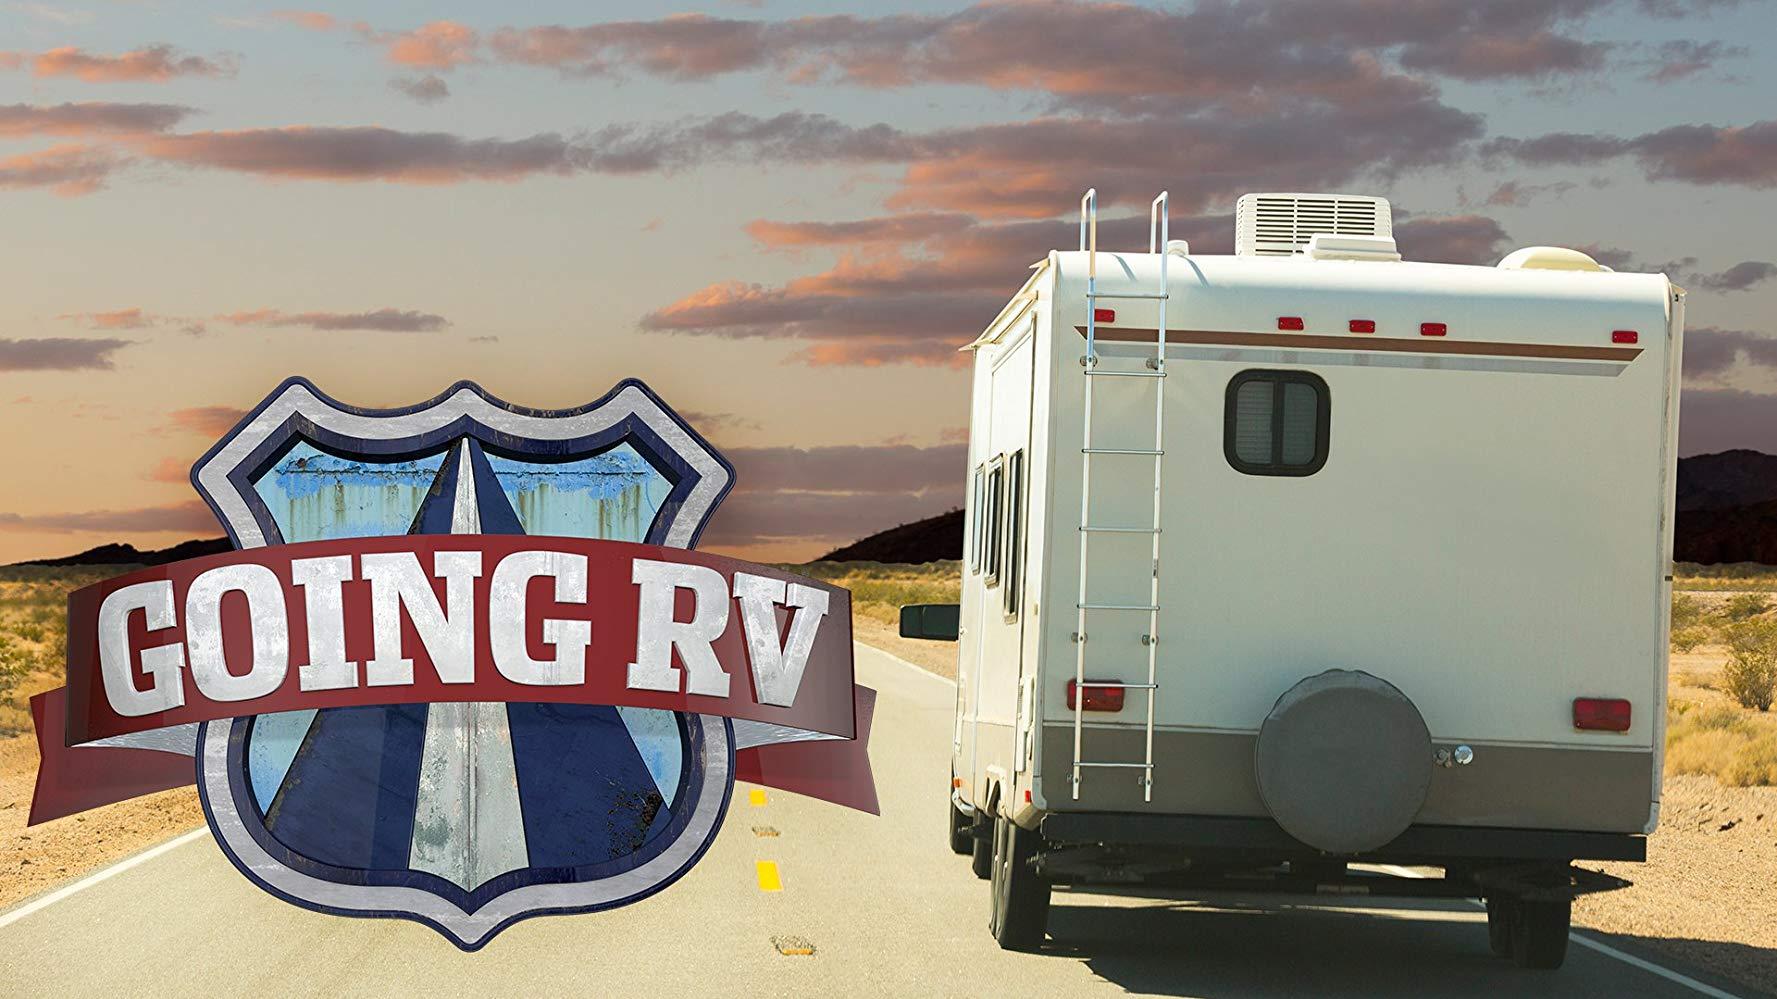 Going RV S01E09 HDTV x264-dotTV